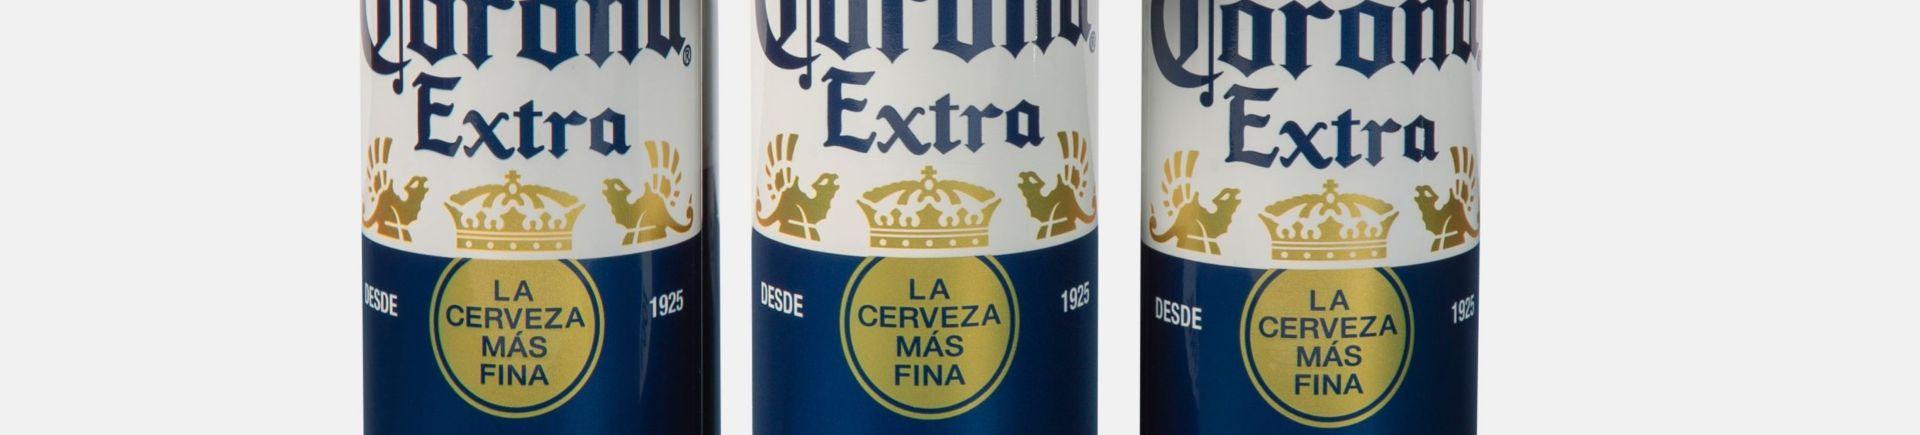 Corona Plastic-Free Six Pack Rings